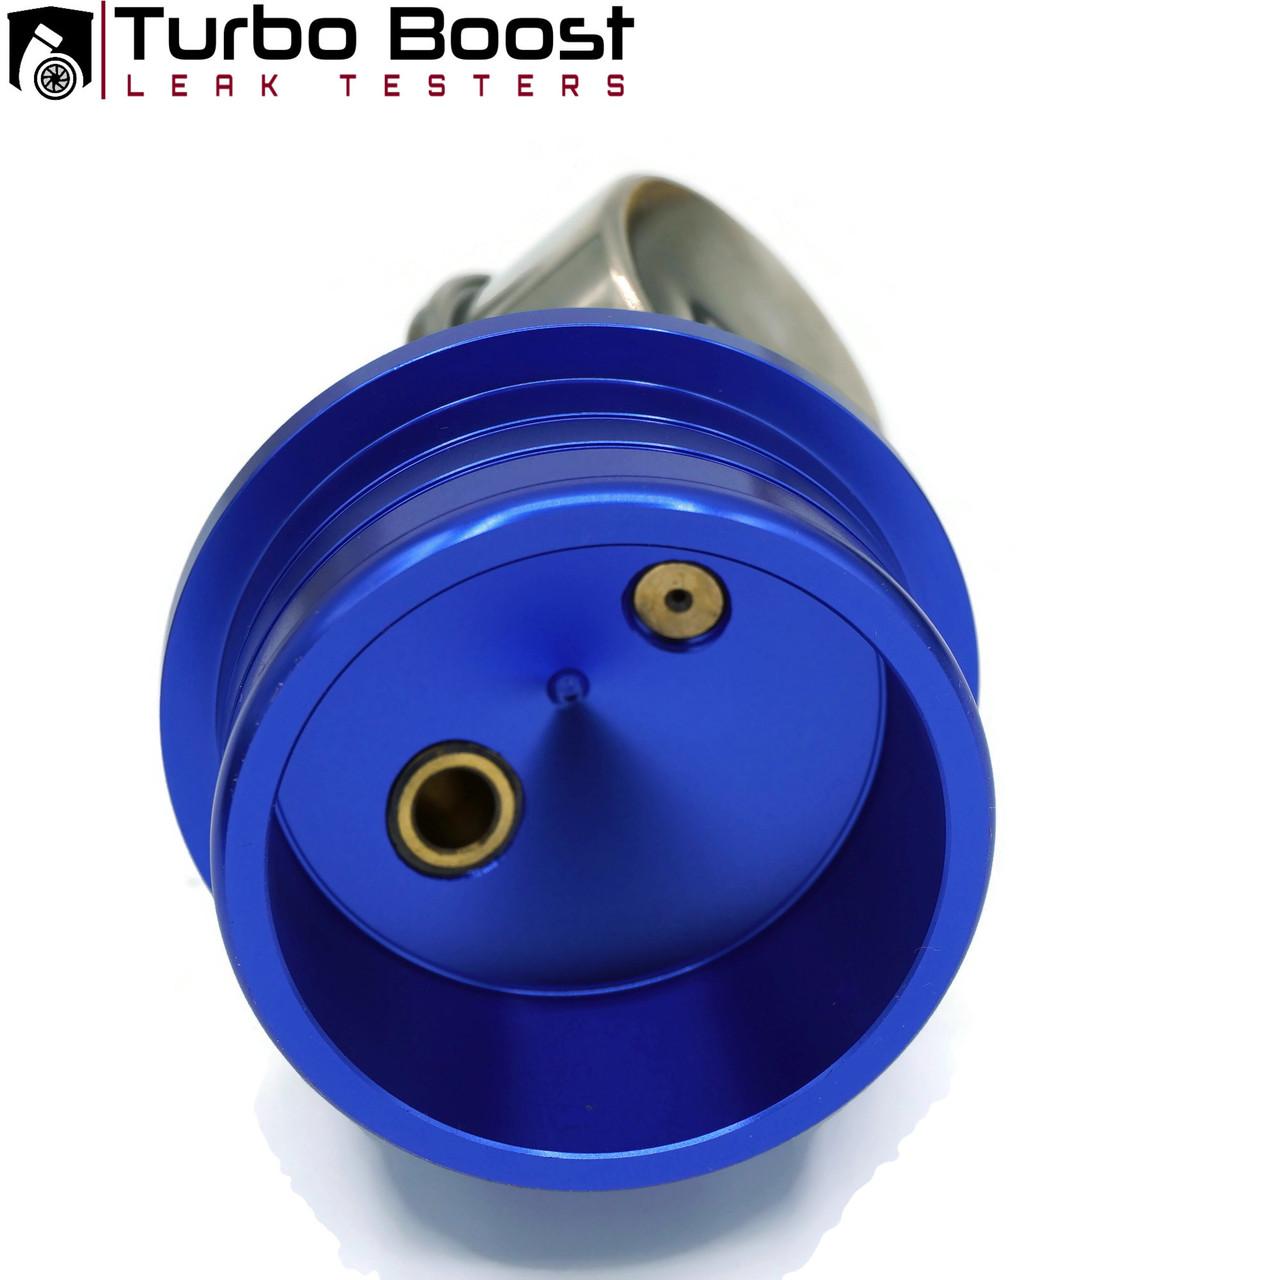 DURAMAX 6.6L Turbo Boost Leak Tester -  BILLET ALUM-  HIGH BOOST 60 PSI - COMP Fitting M-Type - PRO-Kit 5 ft. Extension Line w/On Off Valve - Fits  LB7 / LLY / LBZ / LMM / LML / L5P